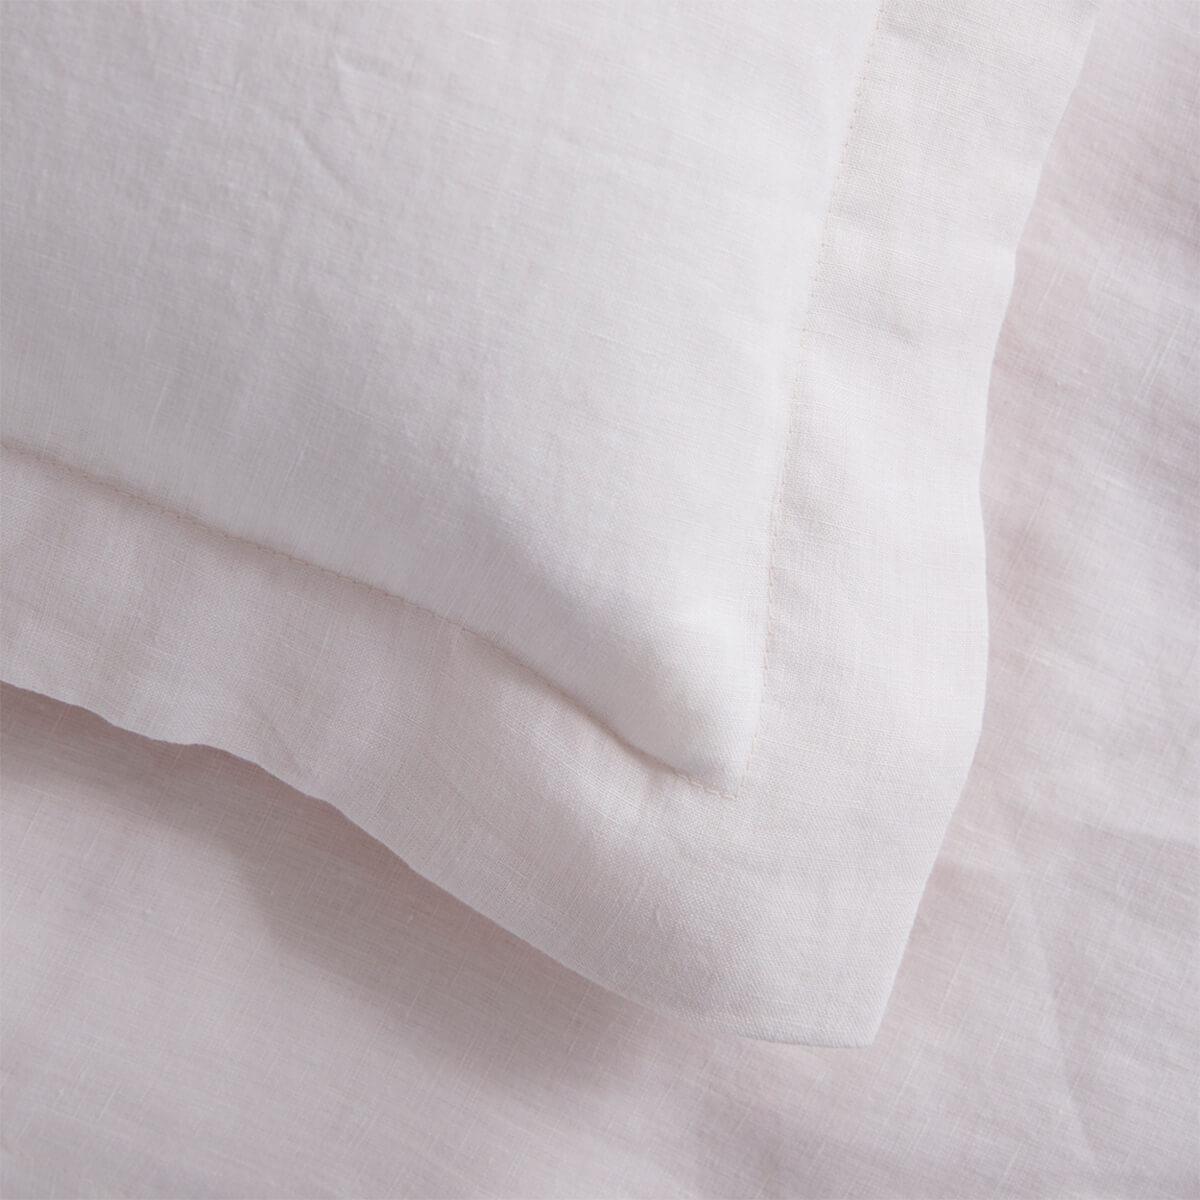 Blush Pink French Linen Square Oxford Pillowcase Pair